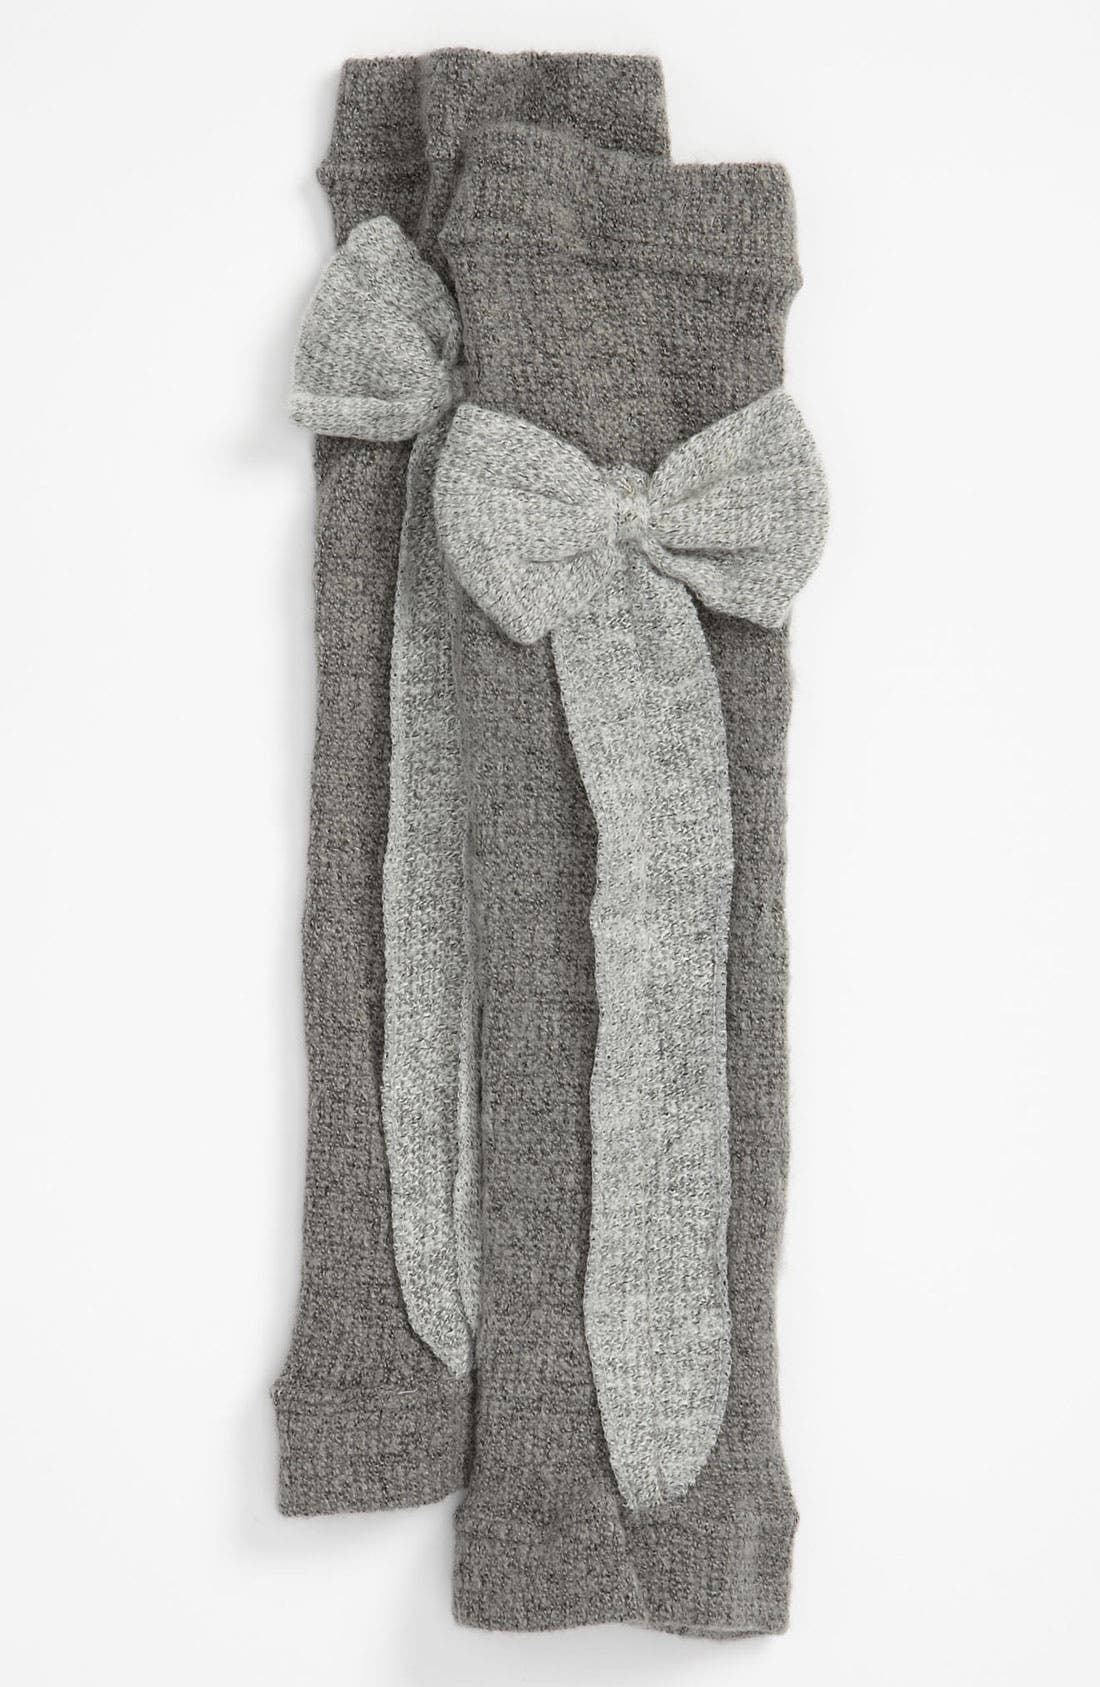 Alternate Image 1 Selected - Nordstrom 'Ribbon Bow' Leg Warmers (Girls)